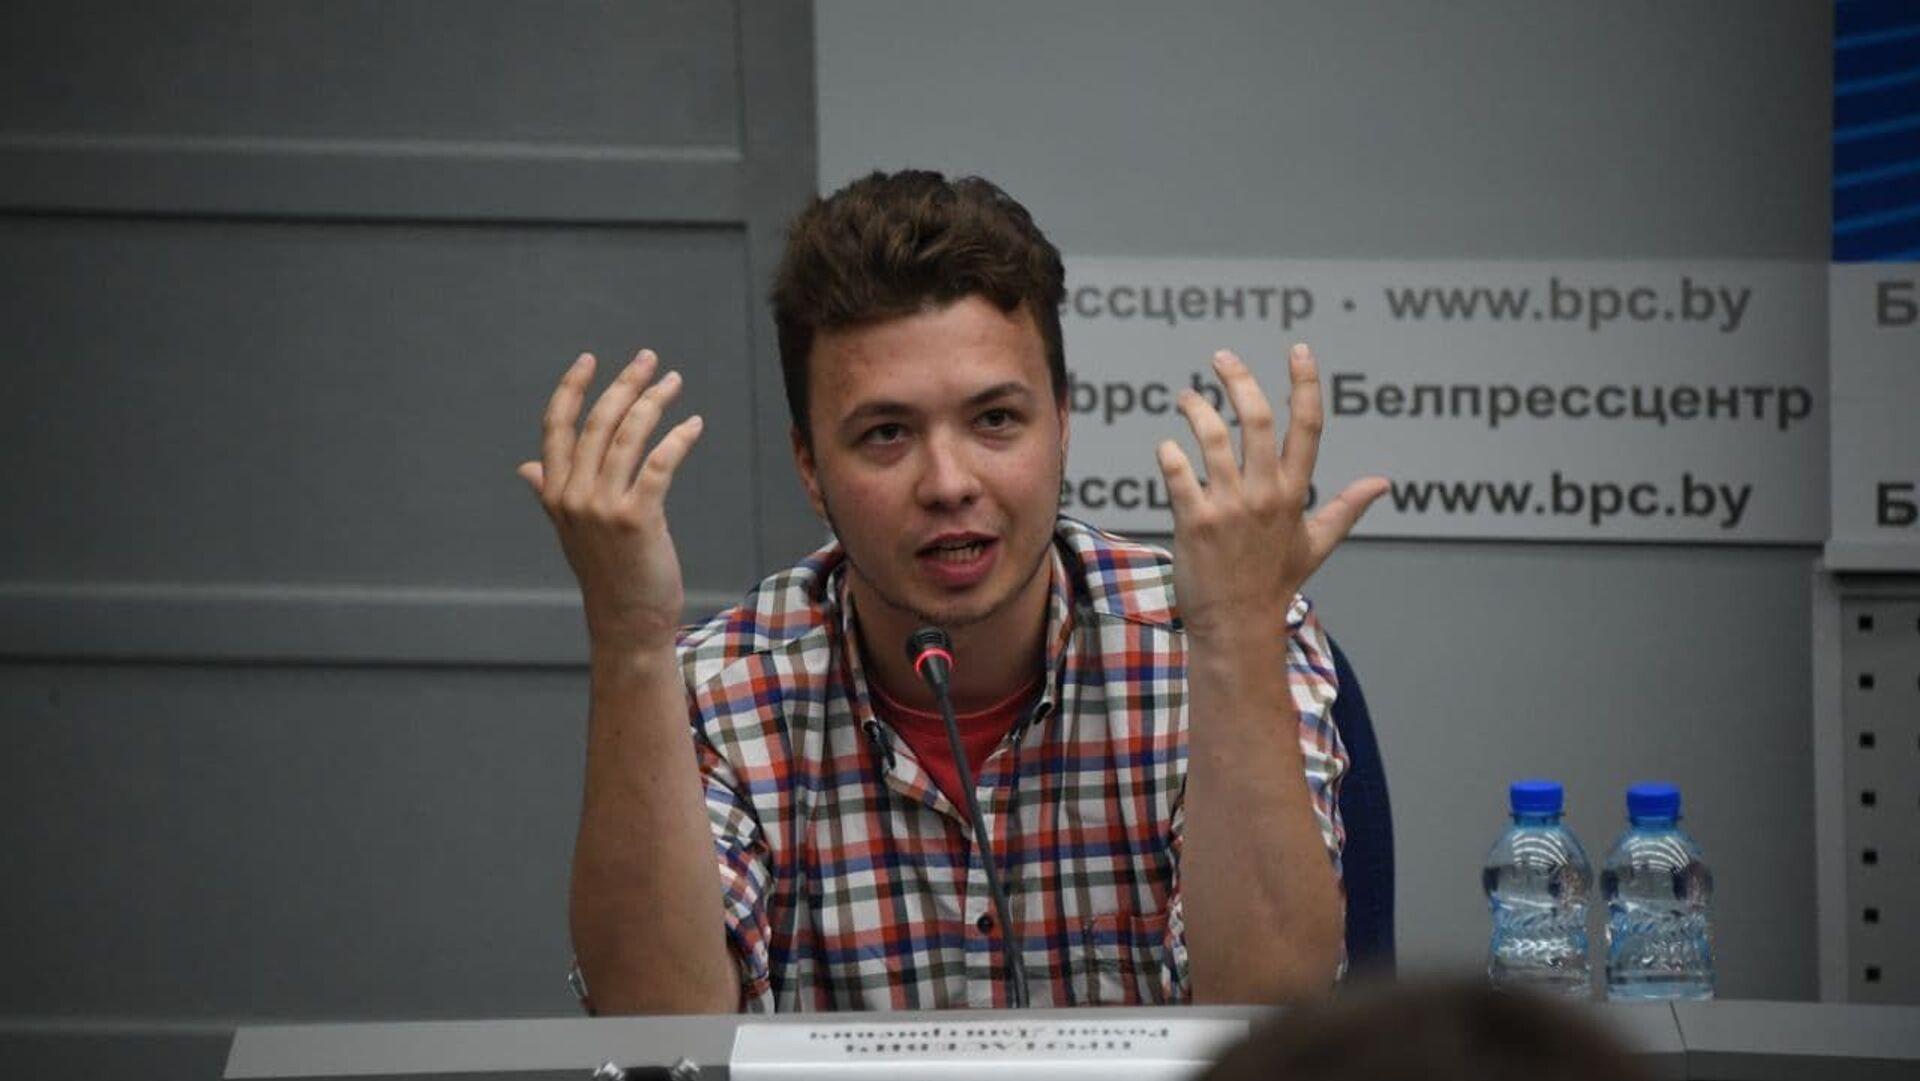 Раман Пратасевіч - Sputnik Беларусь, 1920, 09.08.2021